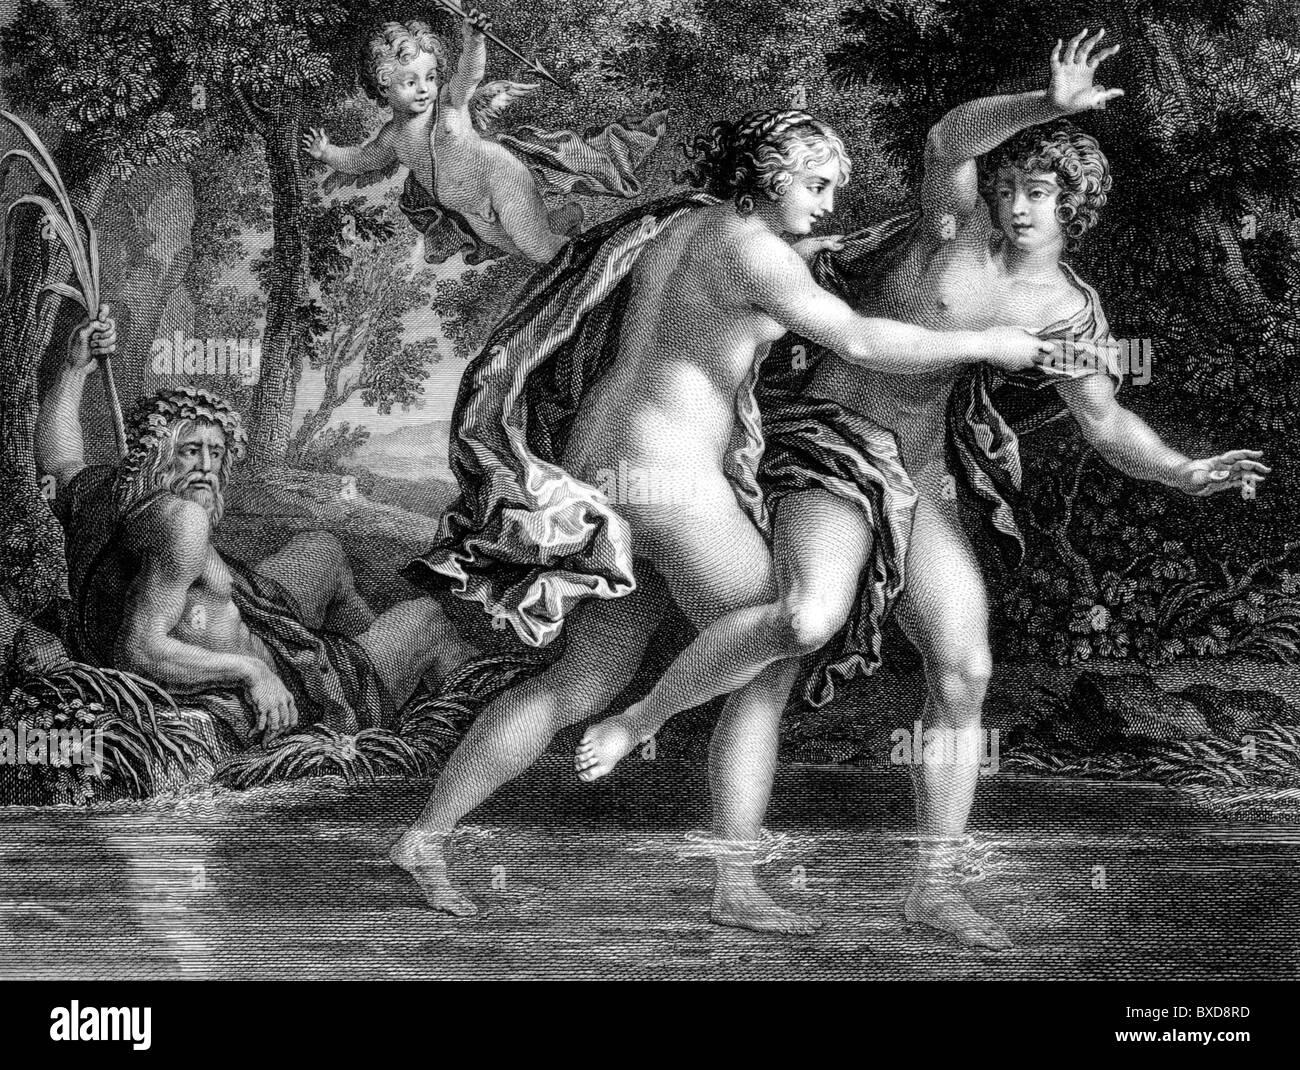 Salmacis & Hermaphroditus (c18th Engraving of Paiting by Paul Mattei) - Stock Image